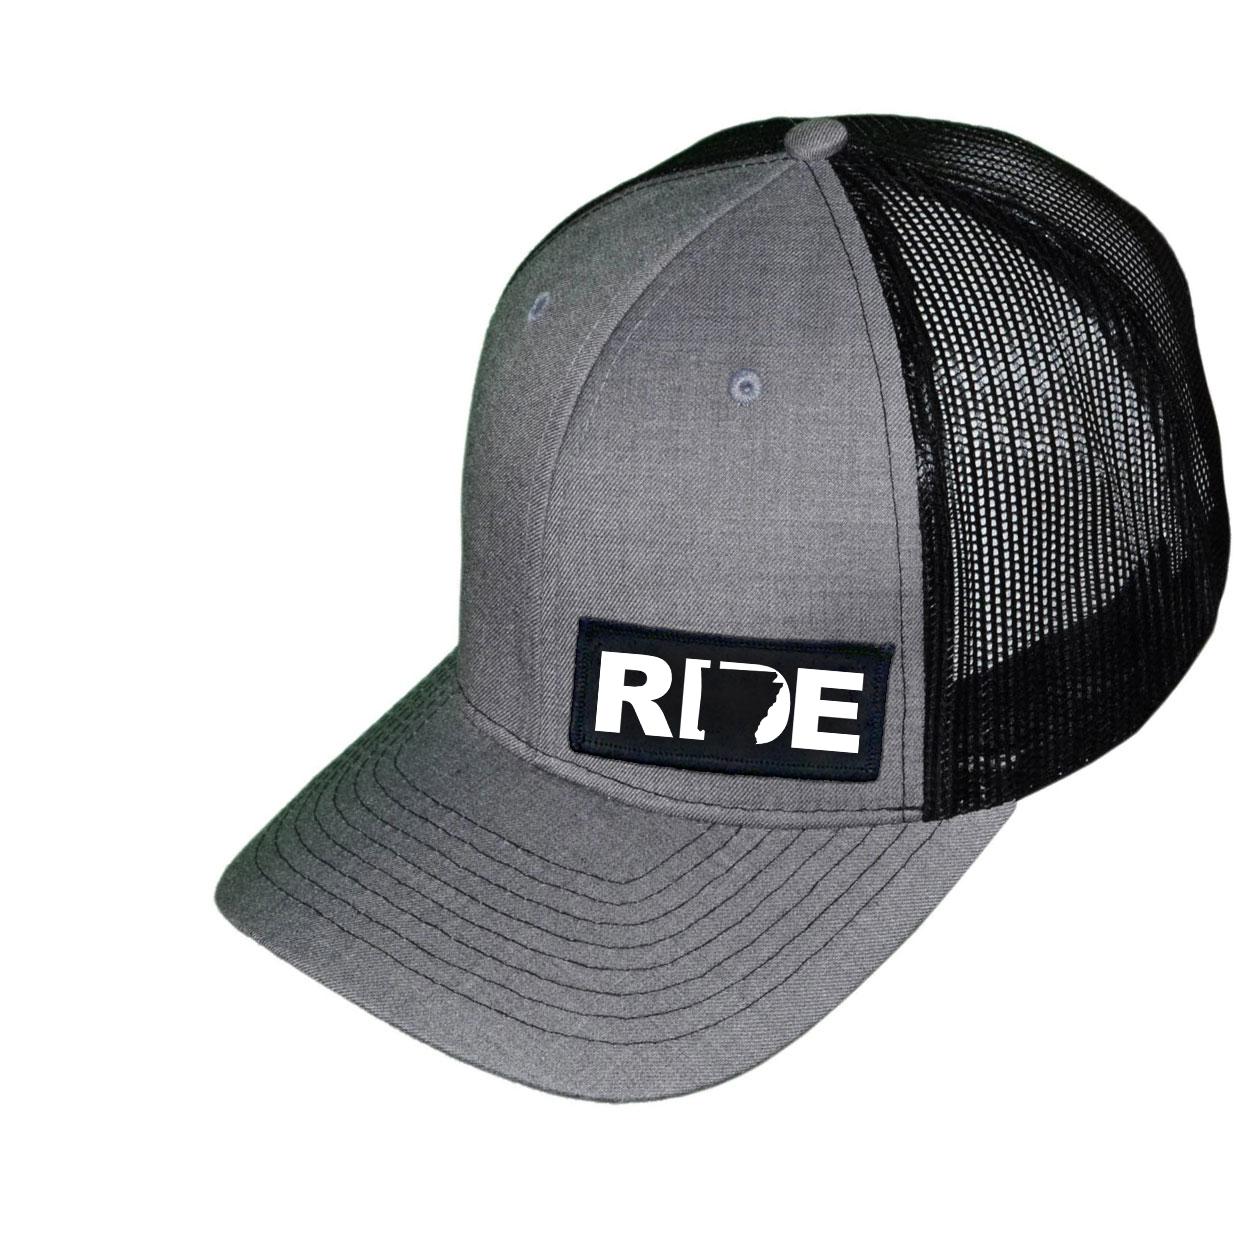 Ride Arkansas Night Out Woven Patch Snapback Trucker Hat Heather Gray/Black (White Logo)